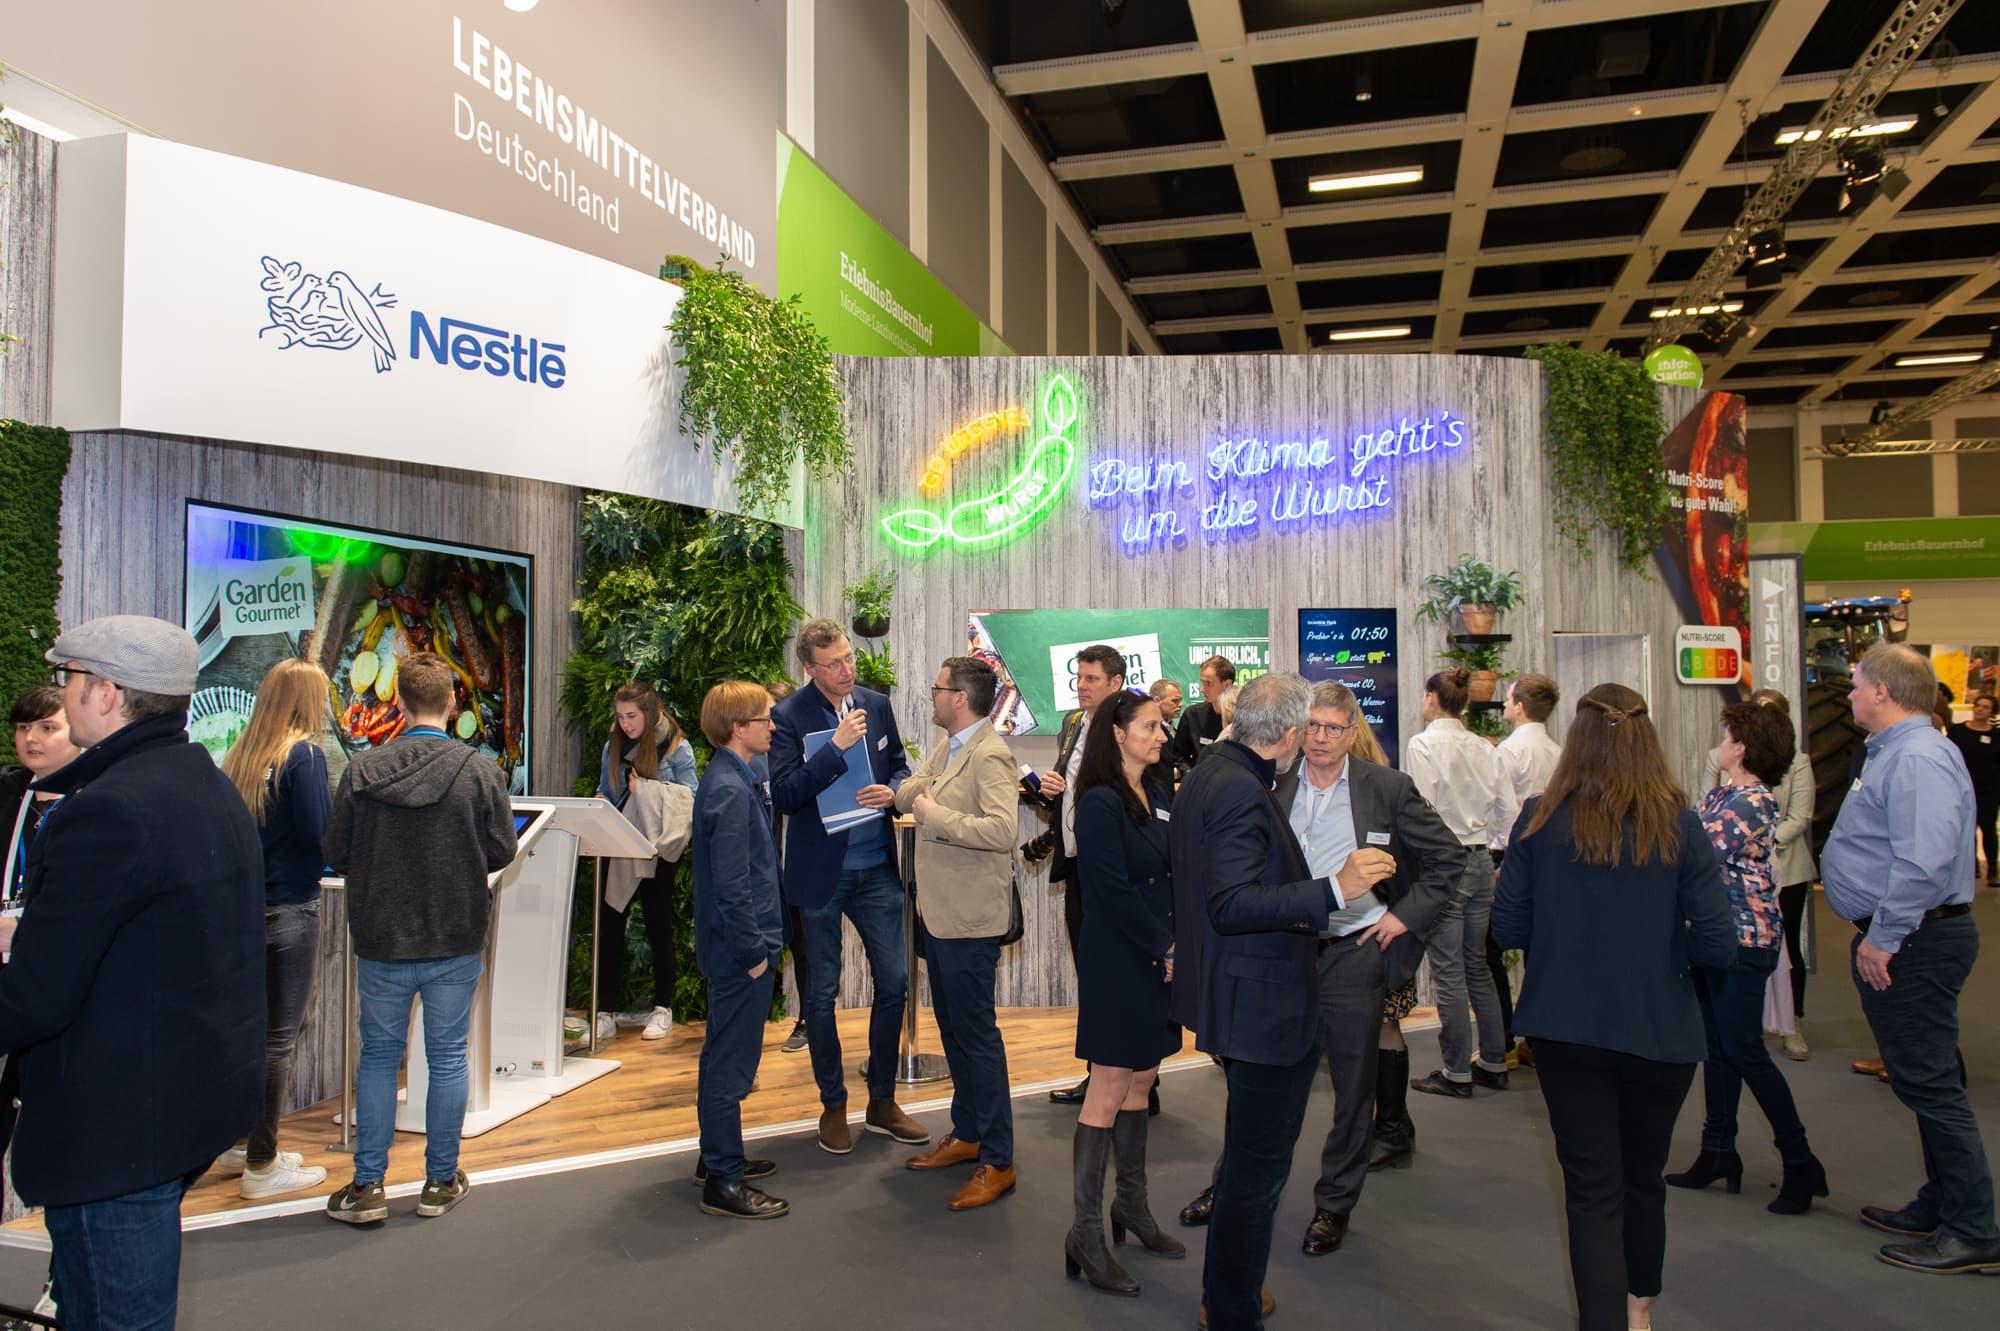 Nestlé Messestand auf der Grünen Woche als bei Partner bei